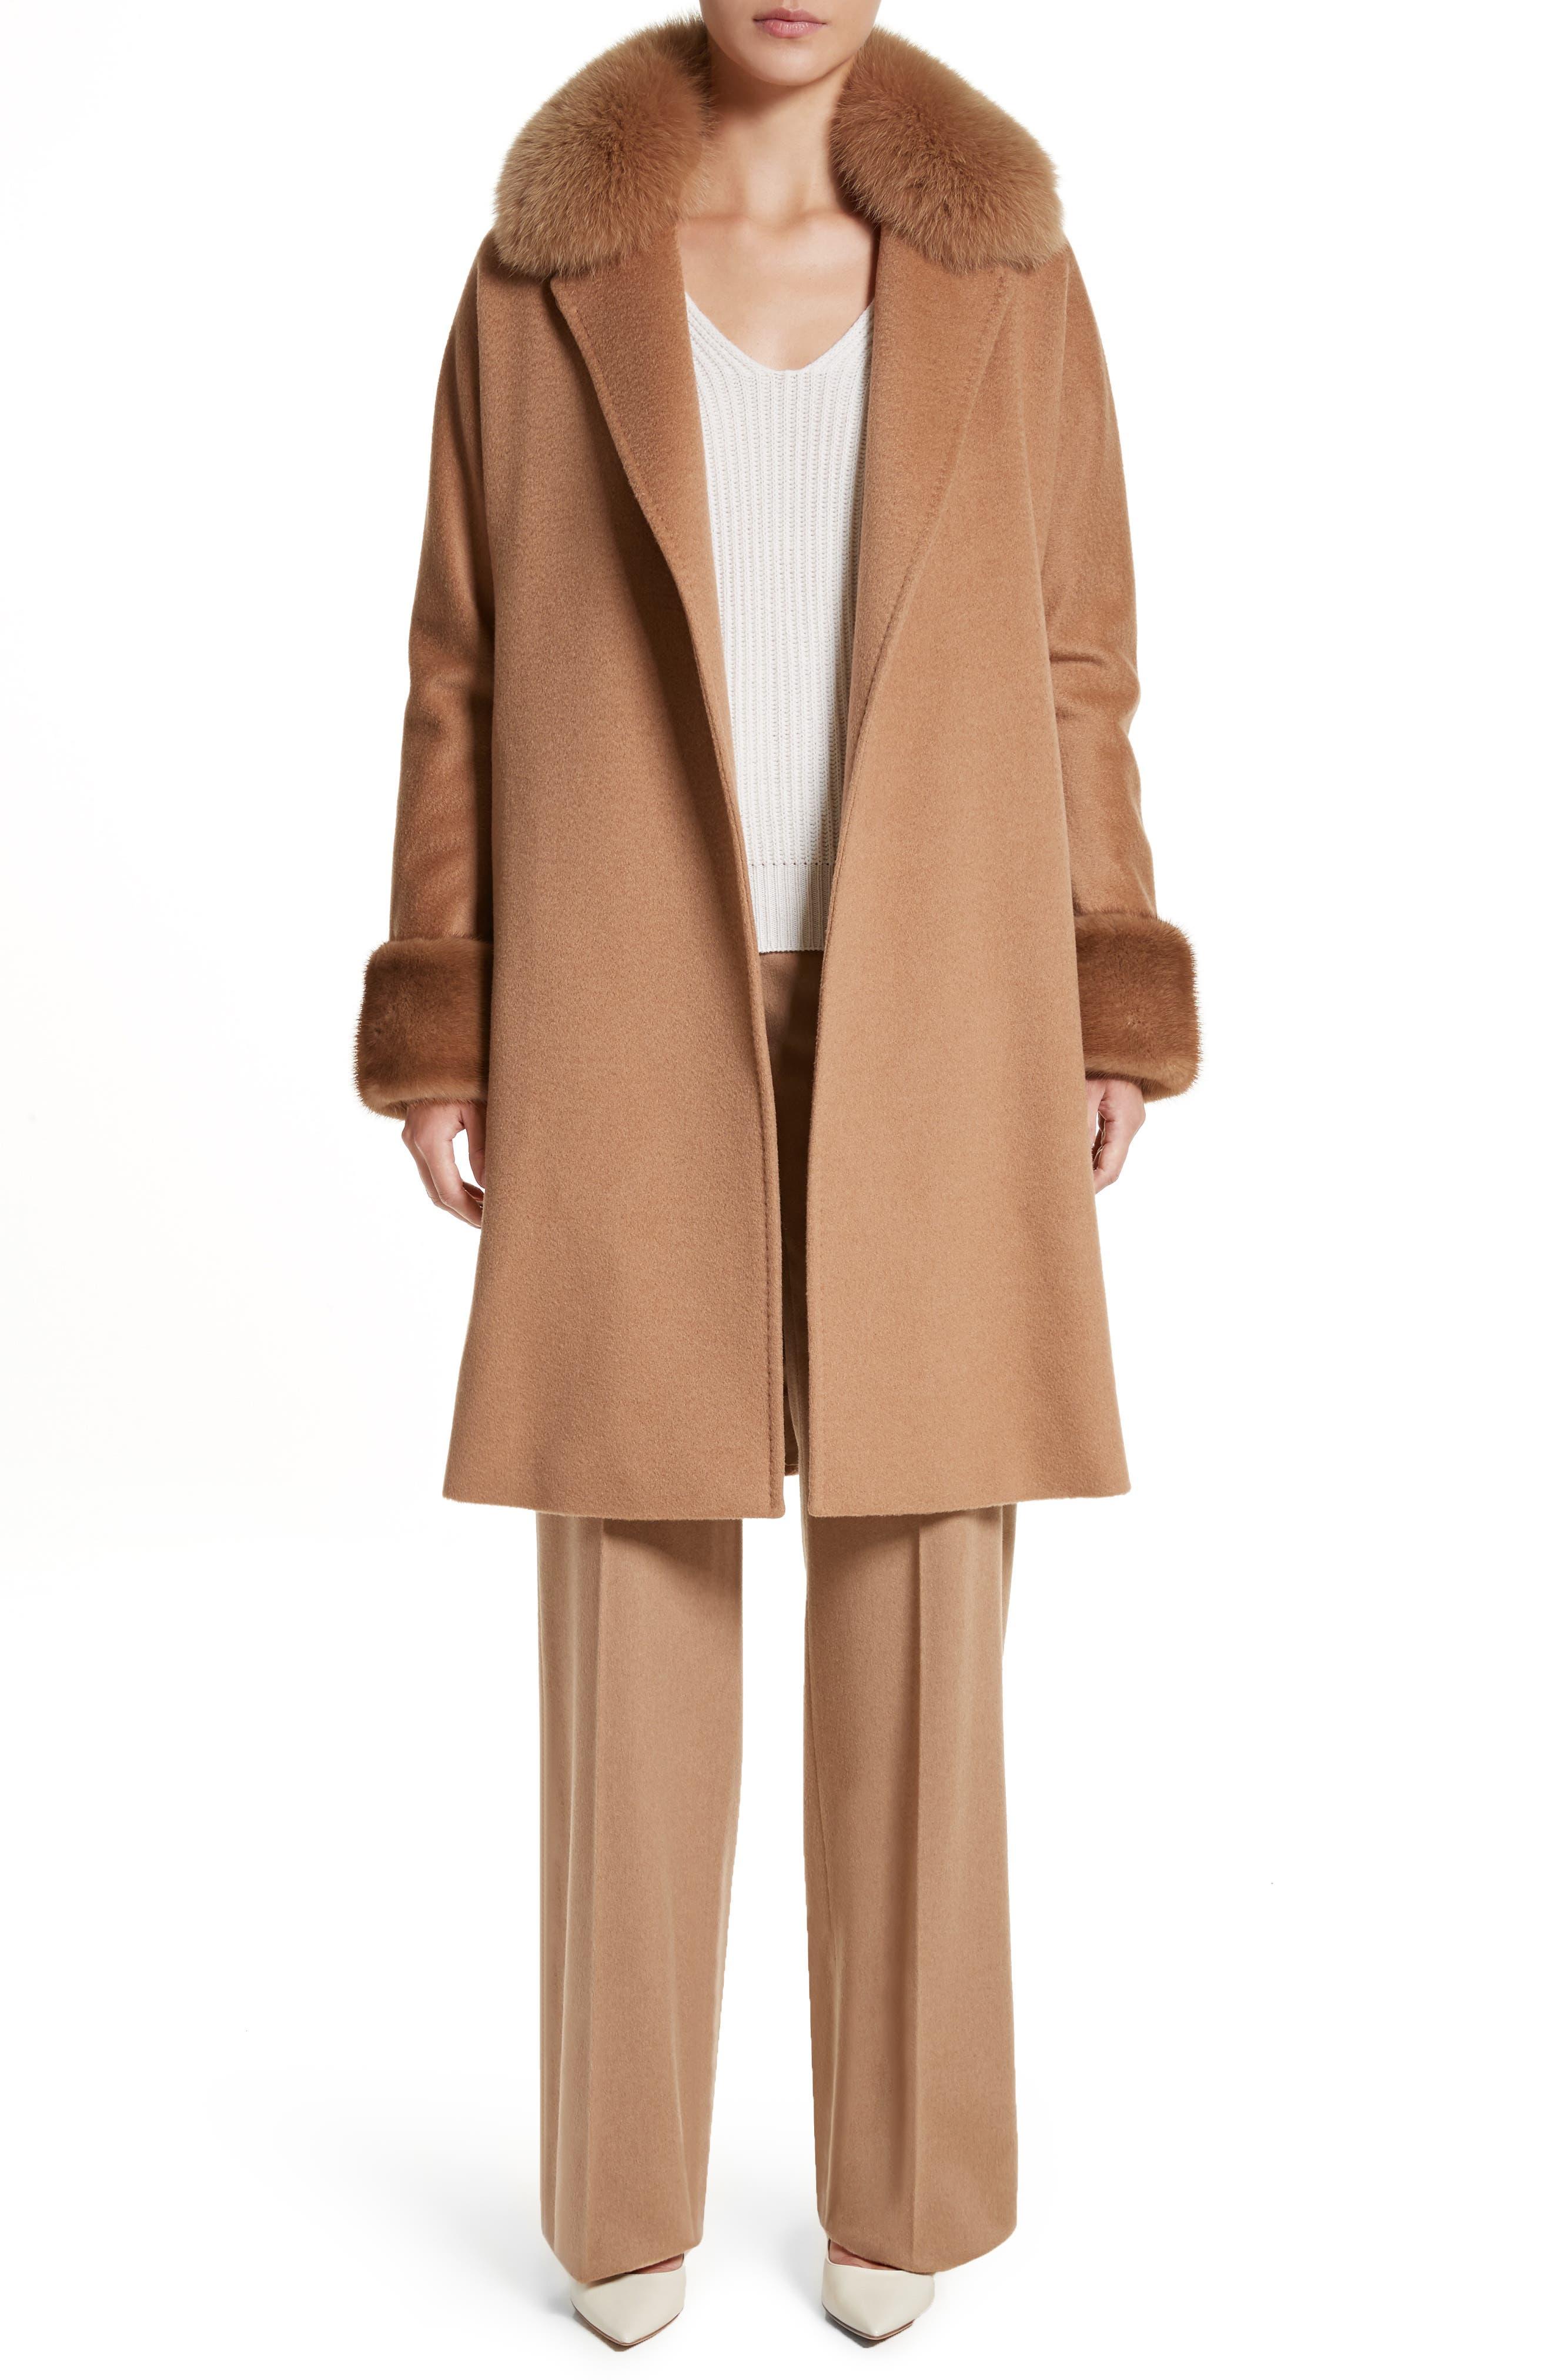 Camel Hair Coat with Genuine Fox Fur & Genuine Mink Fur Trim,                             Alternate thumbnail 7, color,                             232